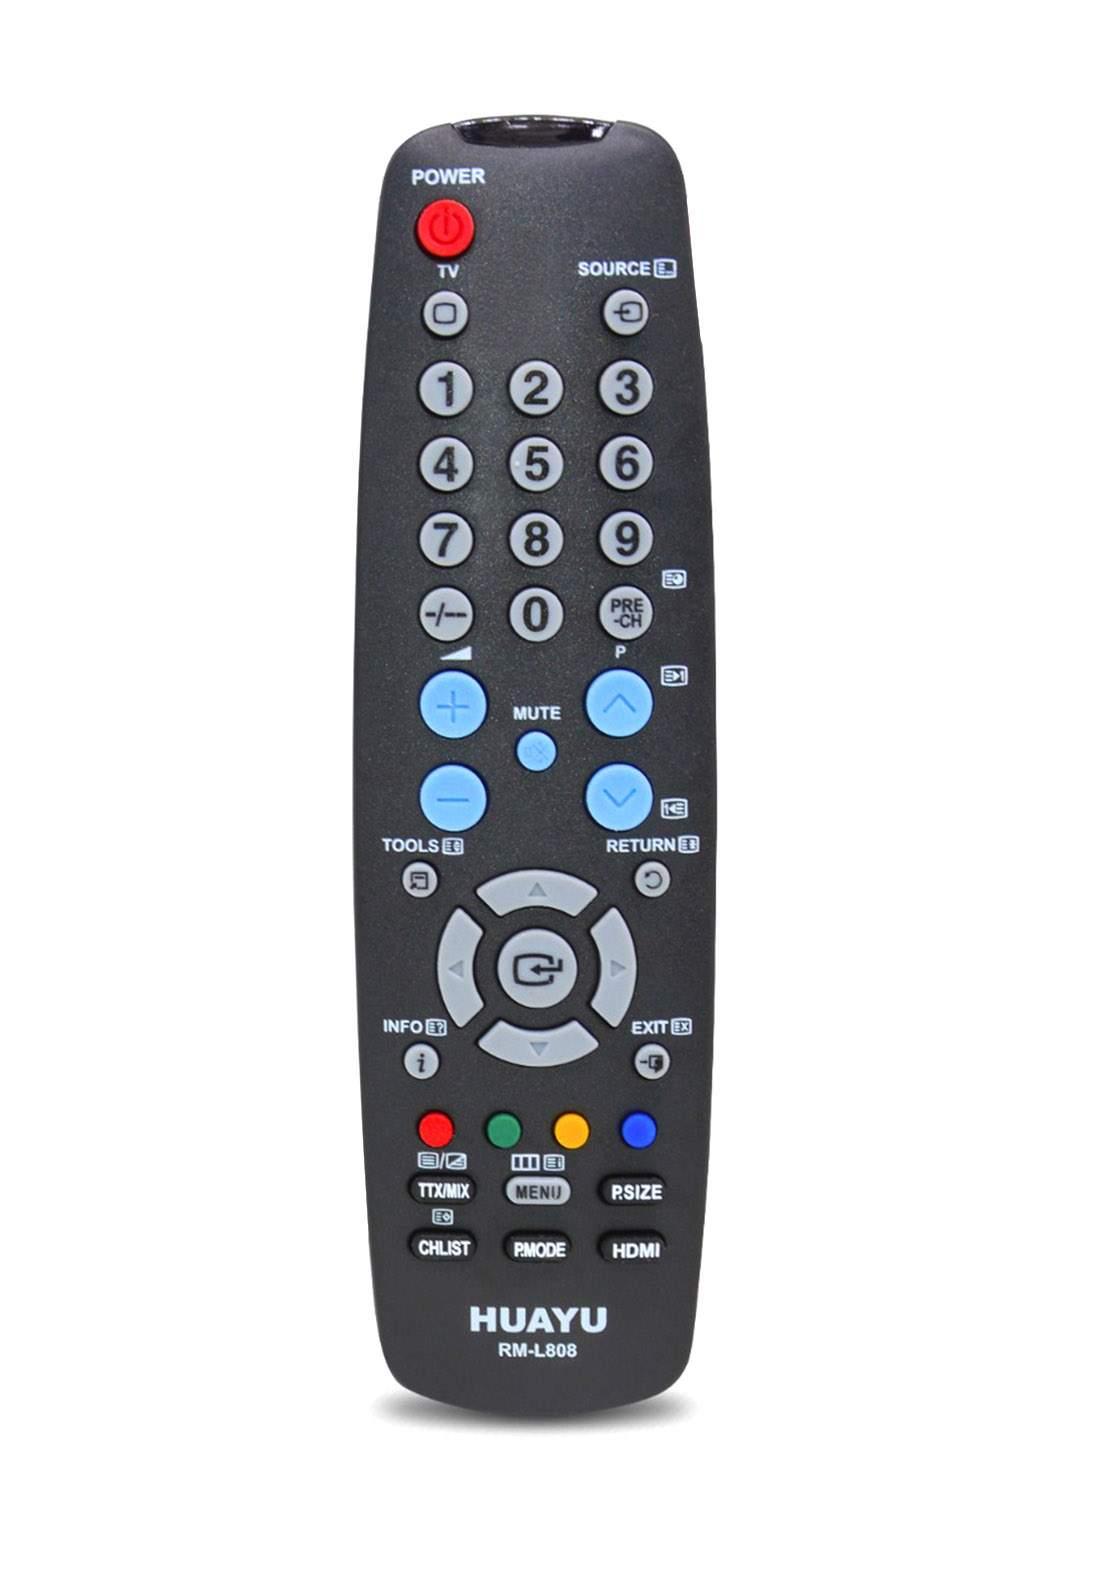 HUAYU Remote Control For Samsung TV - Black جهاز التحكم عن بعد